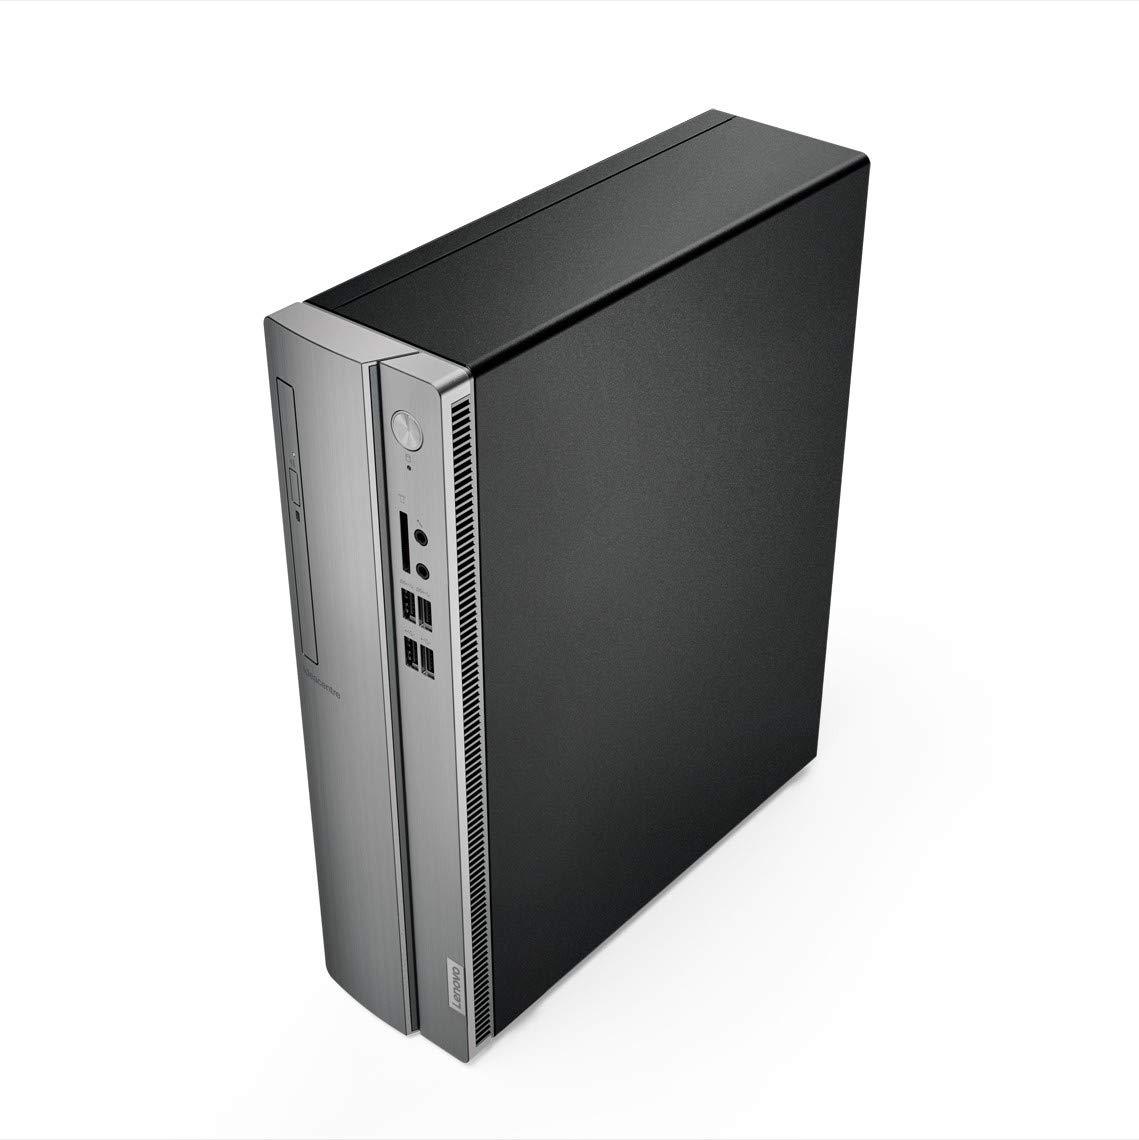 Lenovo 310S 90G9007JIN Tower Desktop A4-9125 Processor (4 GB